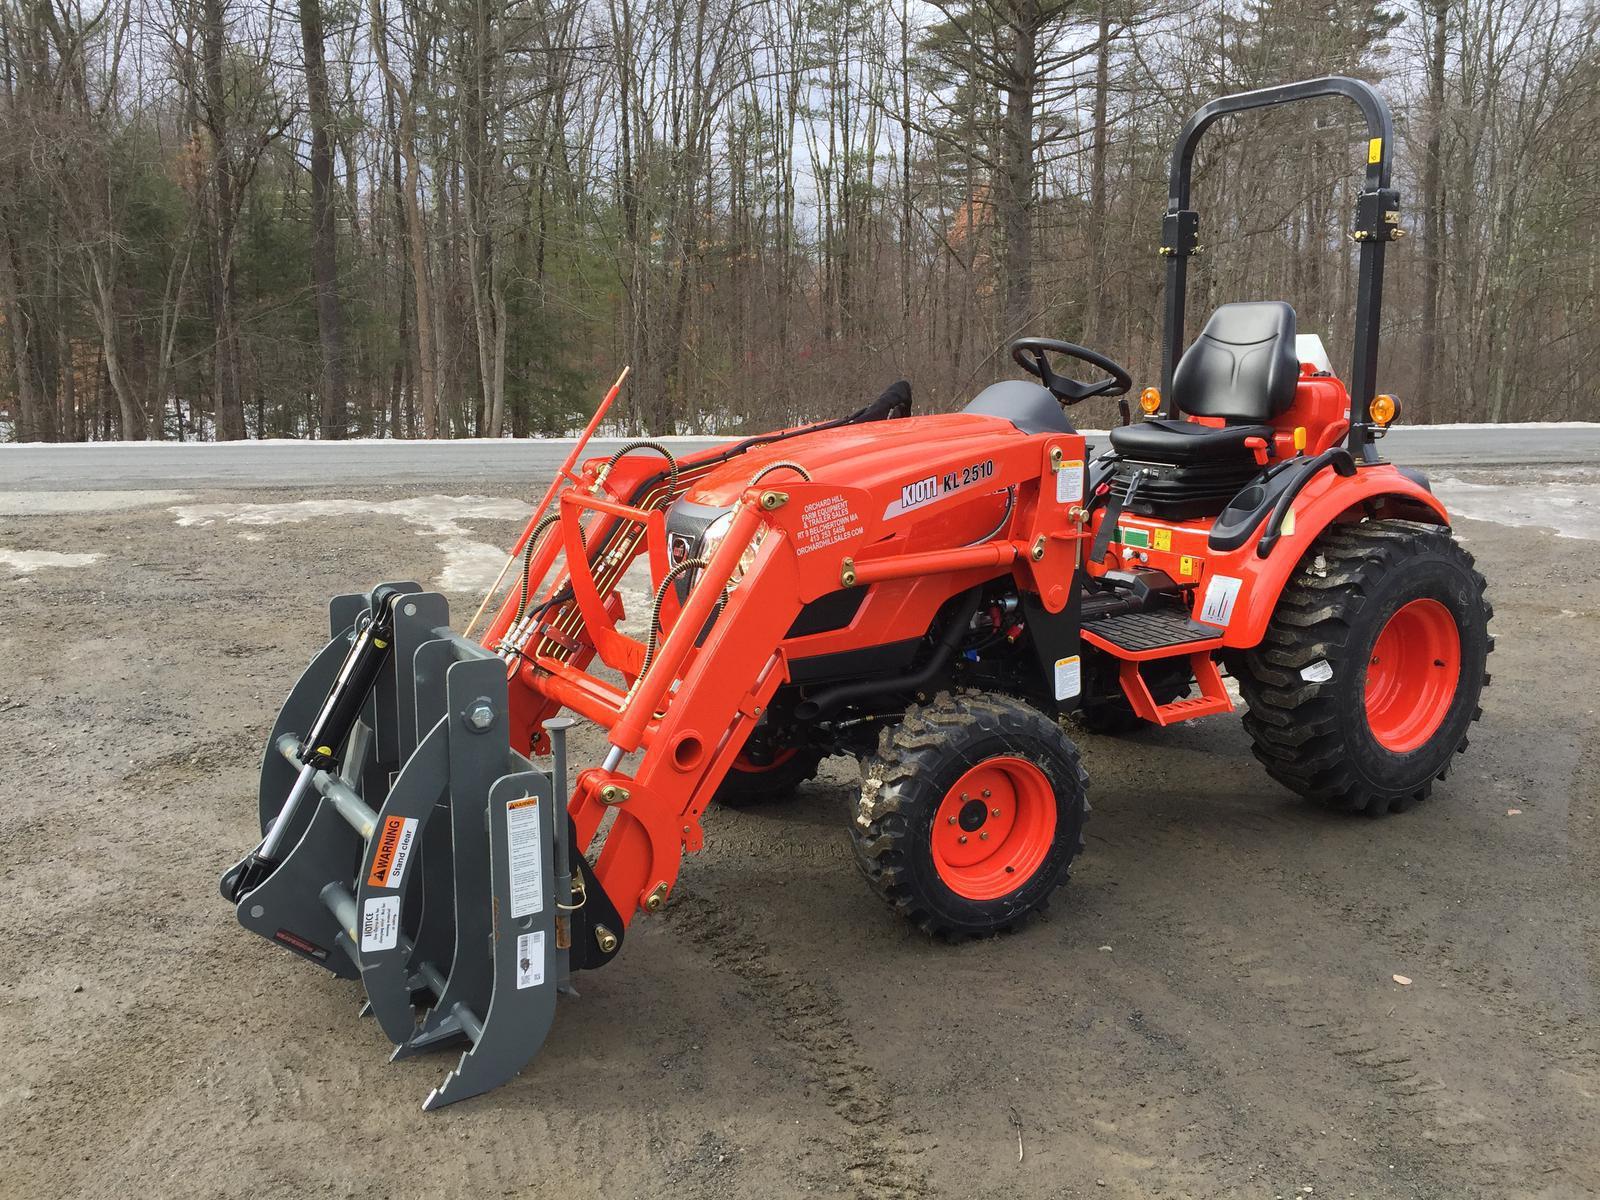 Kioti CK2510 HST Tractor w/ Loader & Grapple for sale in Belchertown